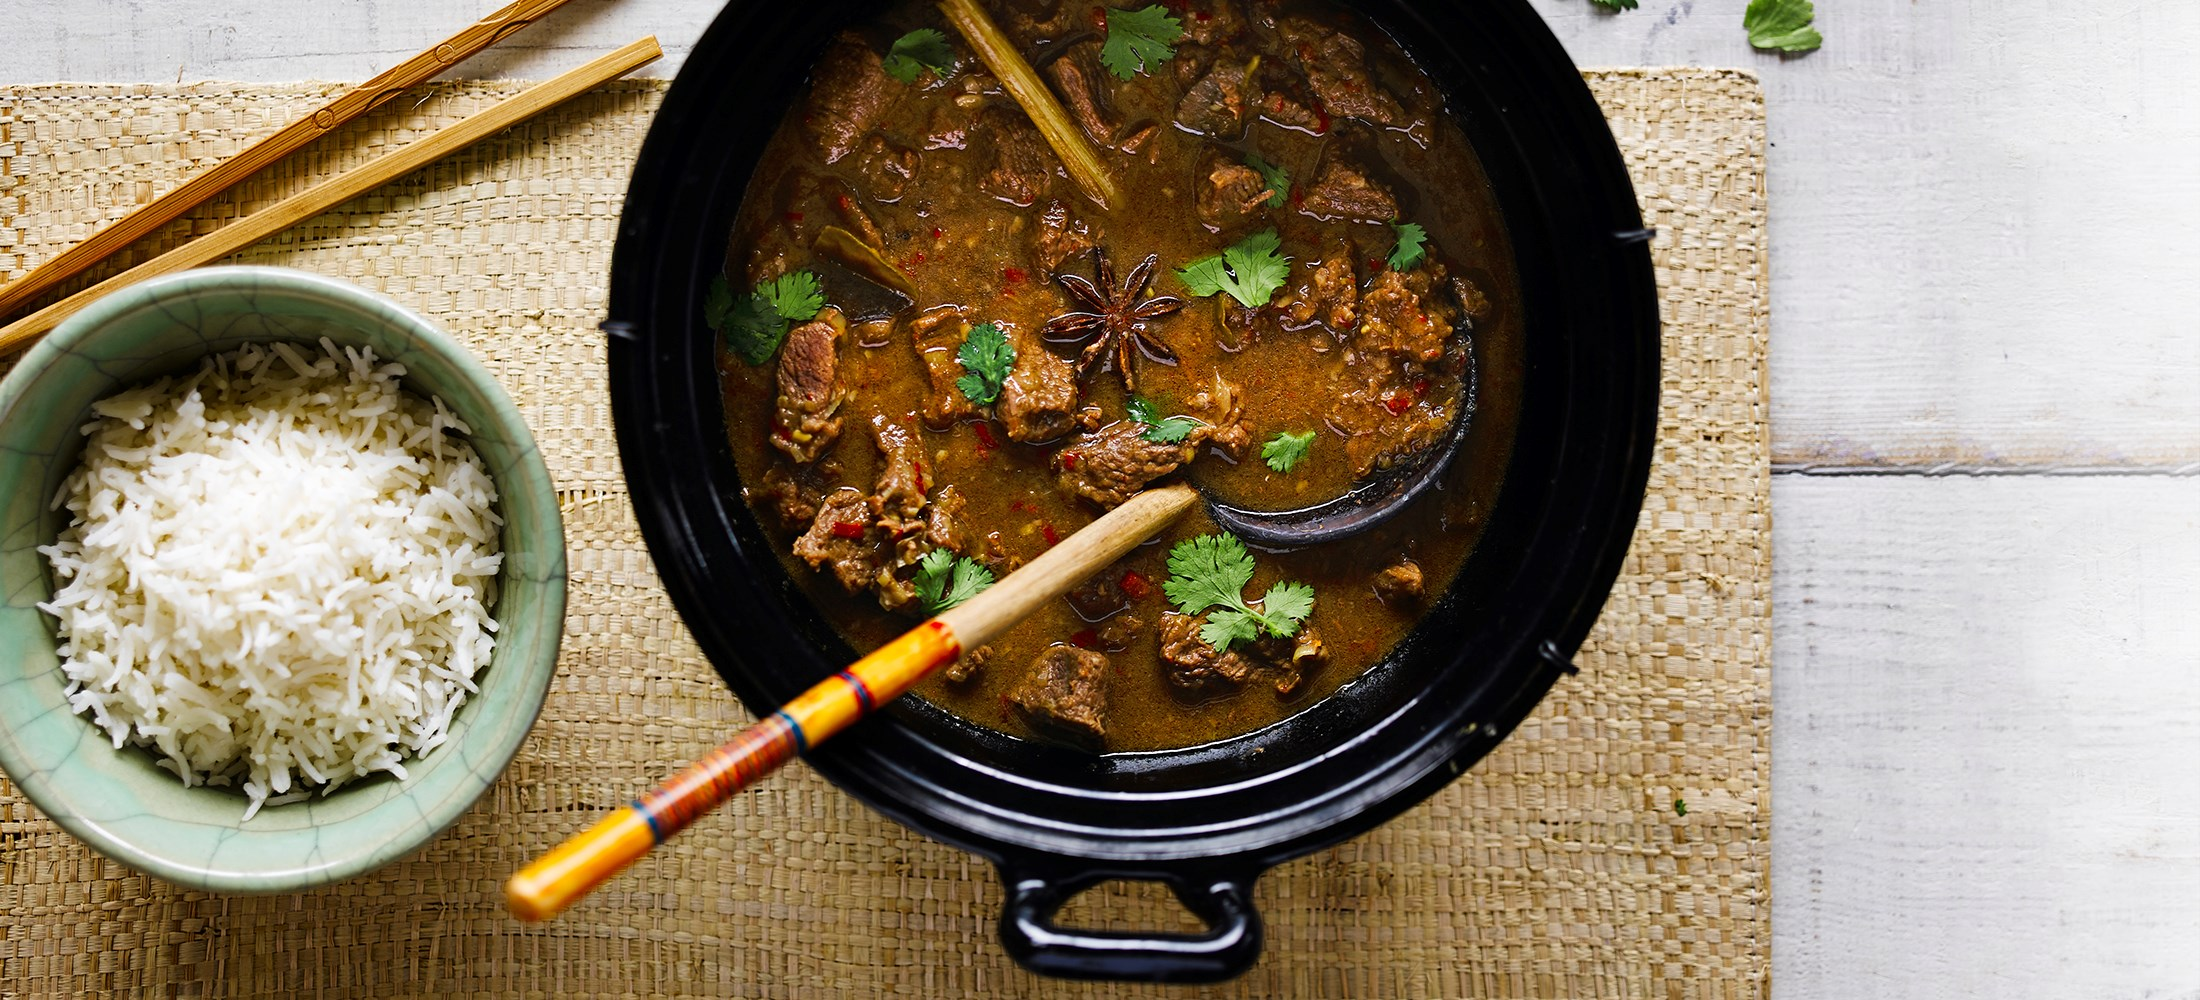 Vietnamese Beef Stew Recipe With Lemongrass